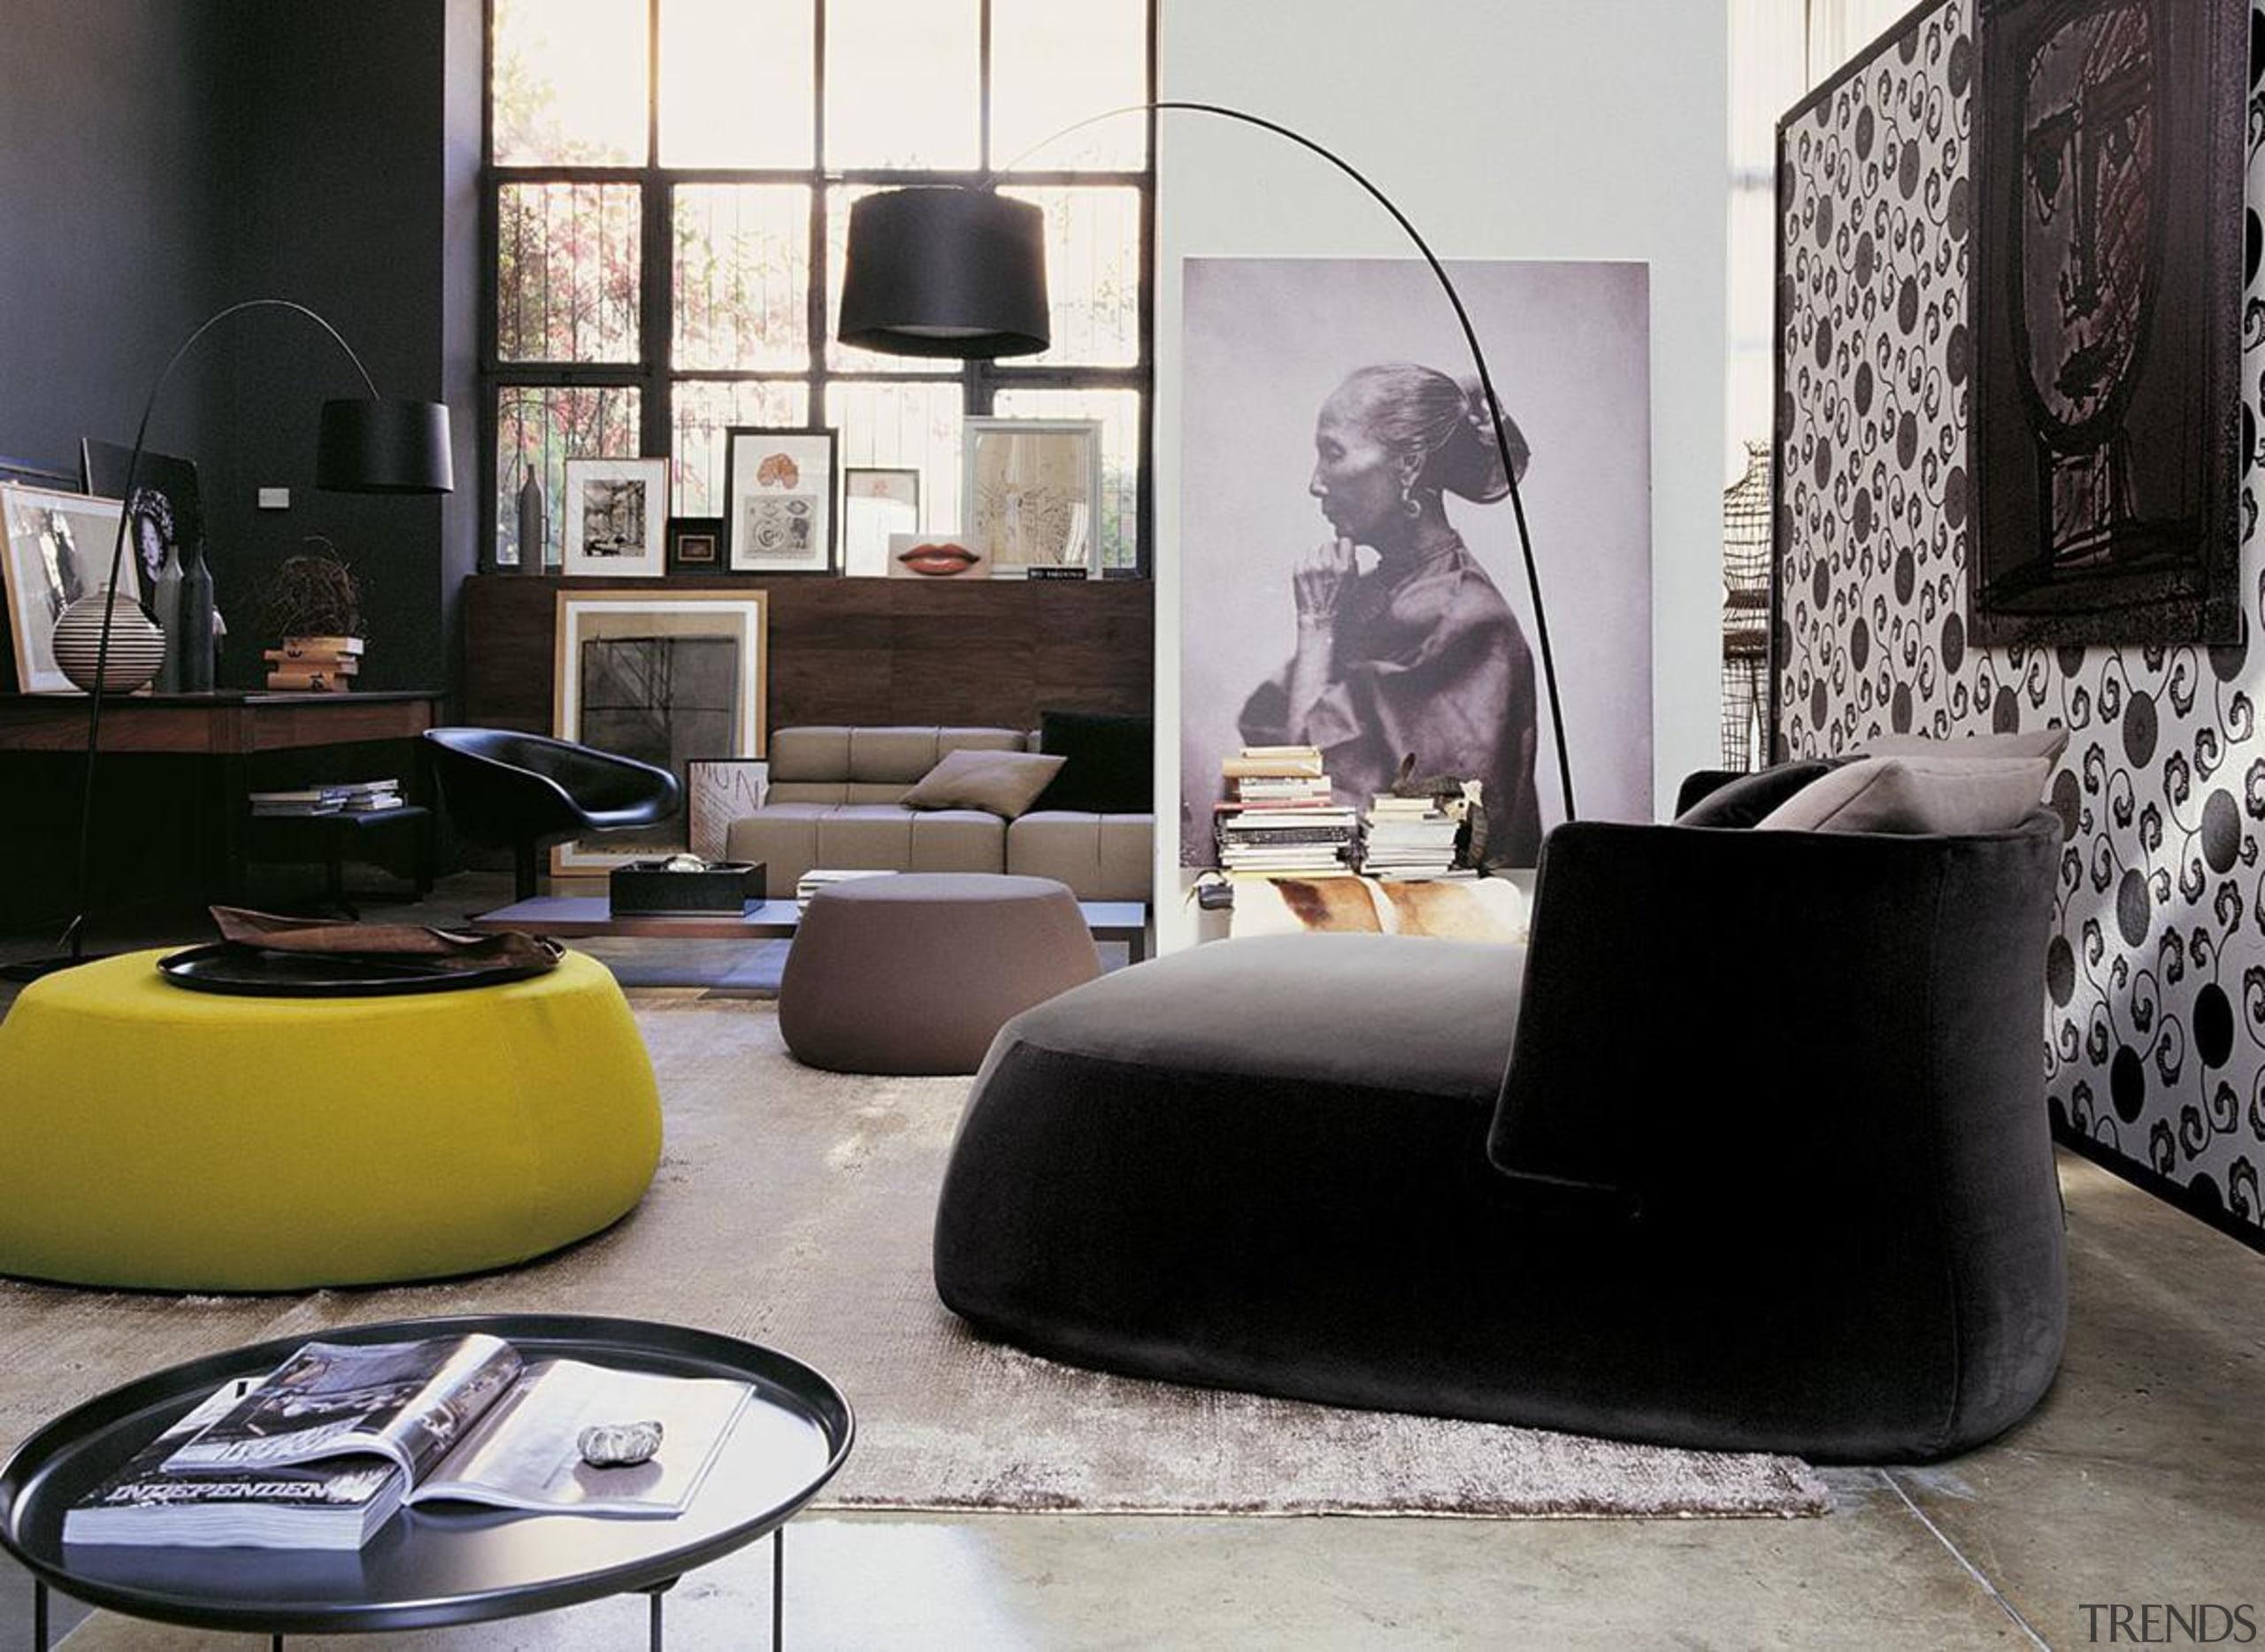 Fat sofa by Patricia Urquiola for B&B Italia chair, couch, floor, flooring, furniture, interior design, lamp, light fixture, lighting, living room, product design, room, table, black, gray